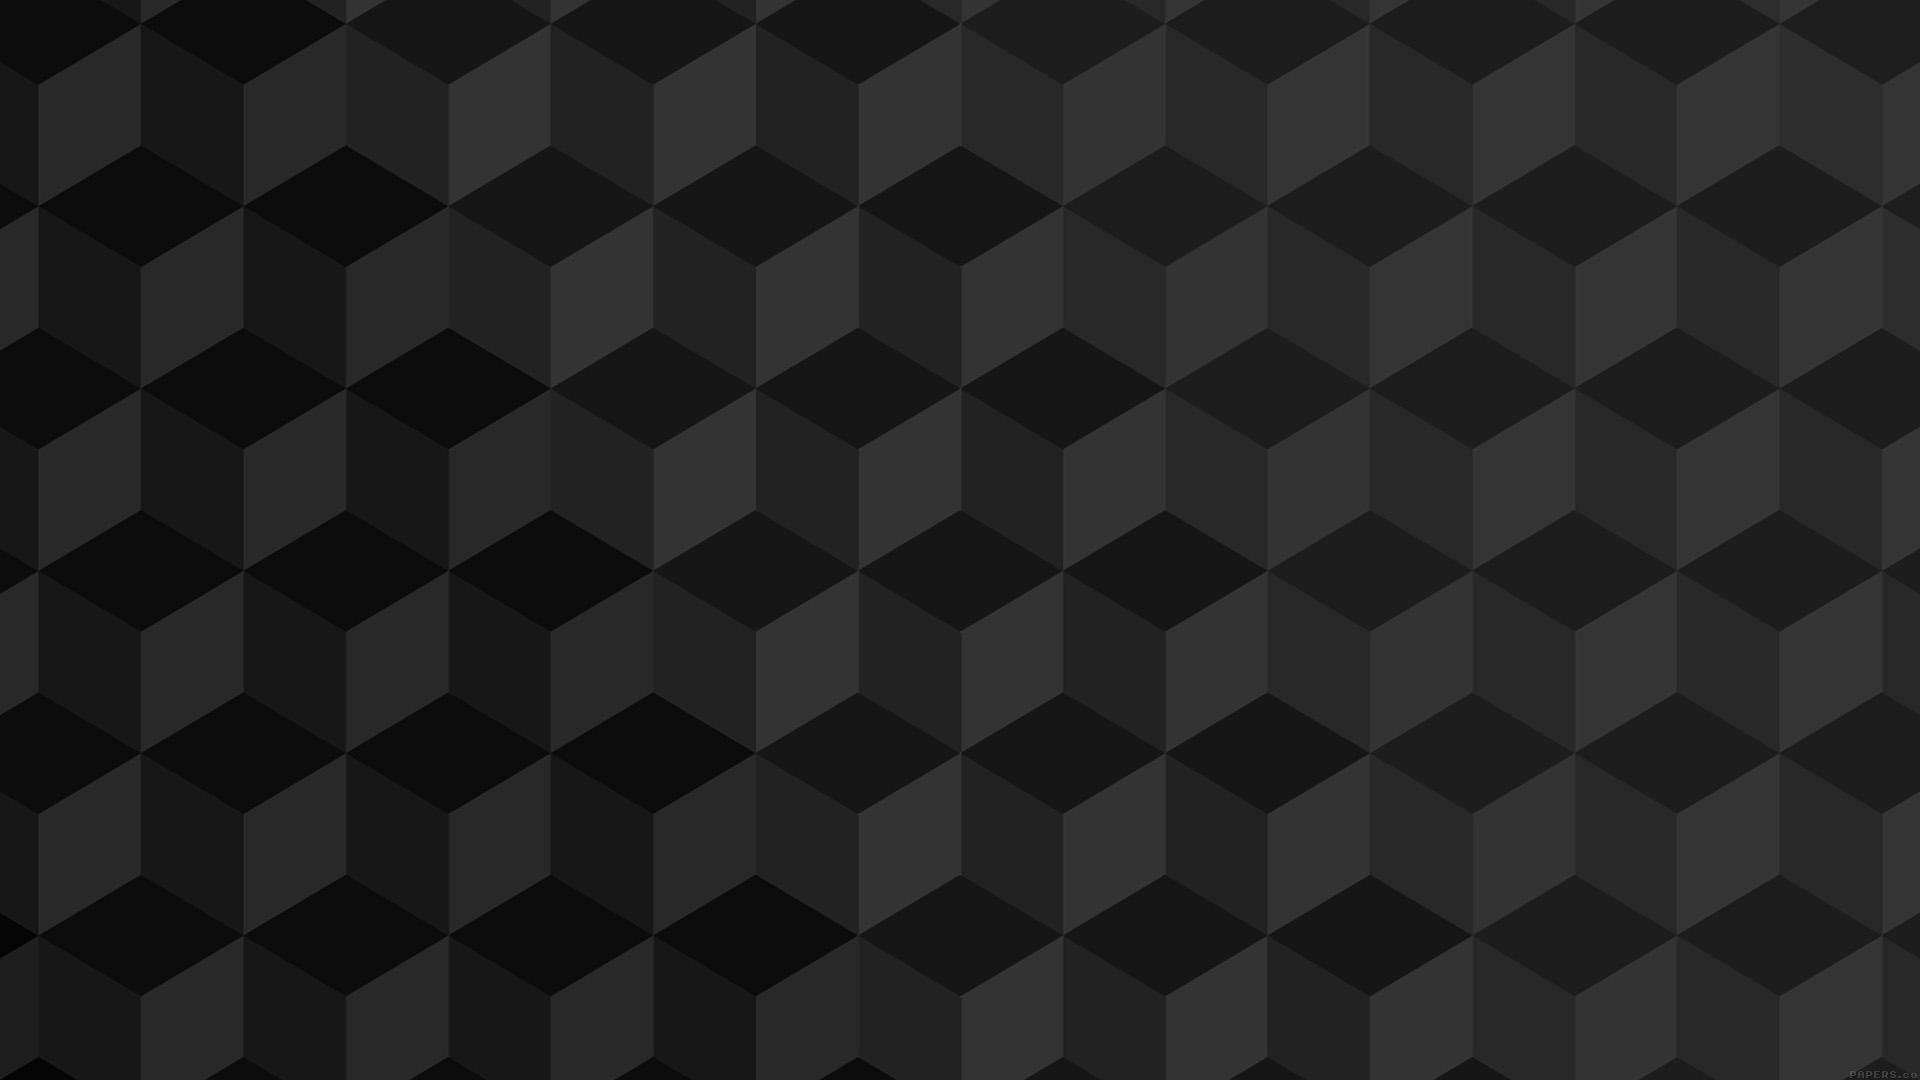 Ariana Grande Wallpaper Iphone 6 2560 X 1600